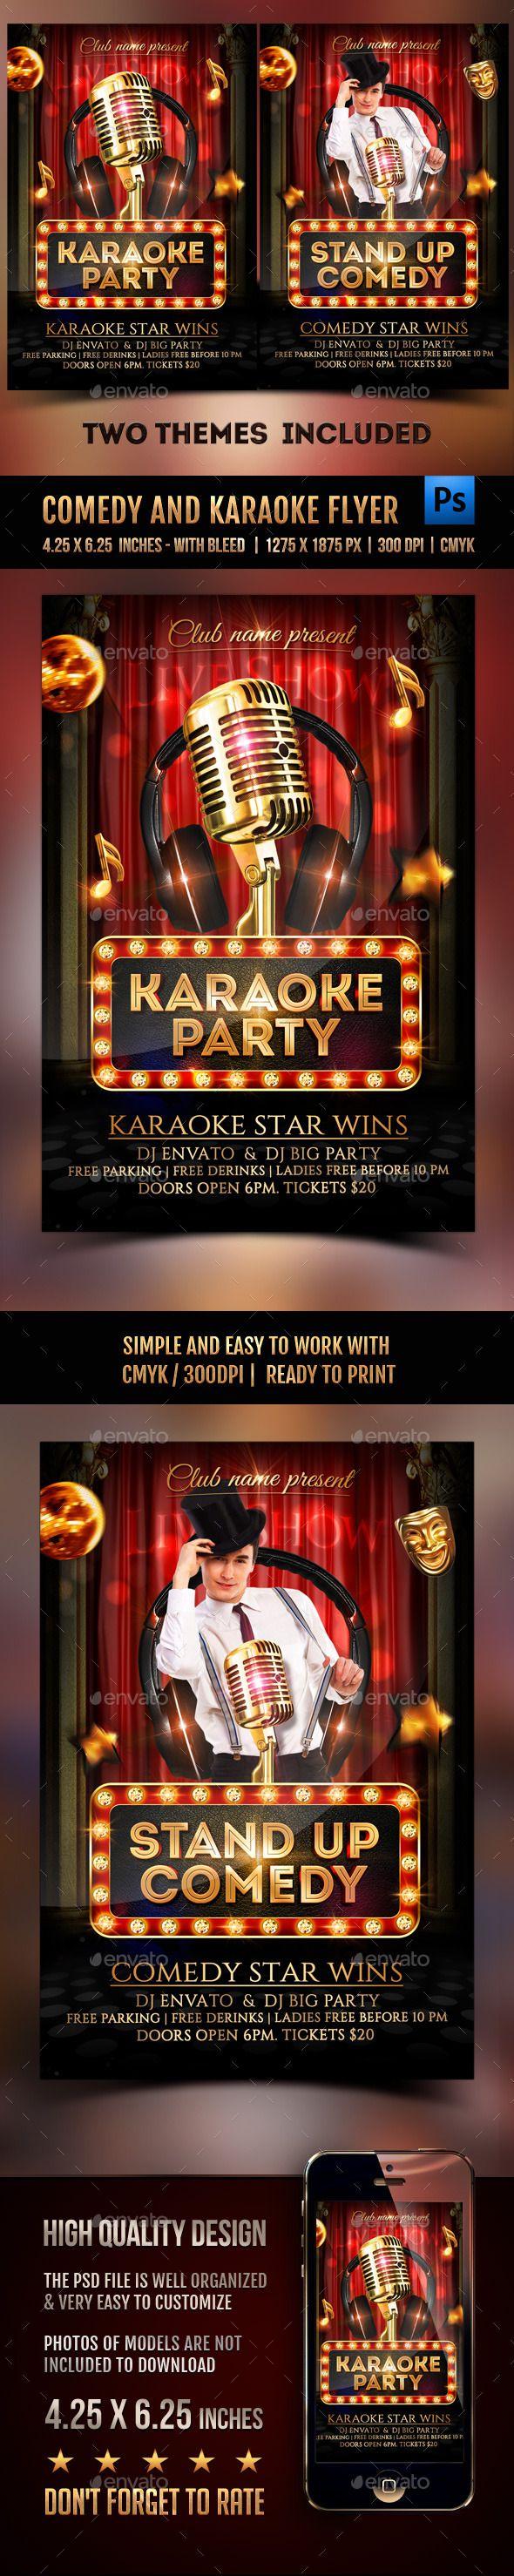 Comedy and Karaoke Party Flyer & Best 25+ Karaoke ideas on Pinterest   Karaoke songs Song list and ... Pezcame.Com